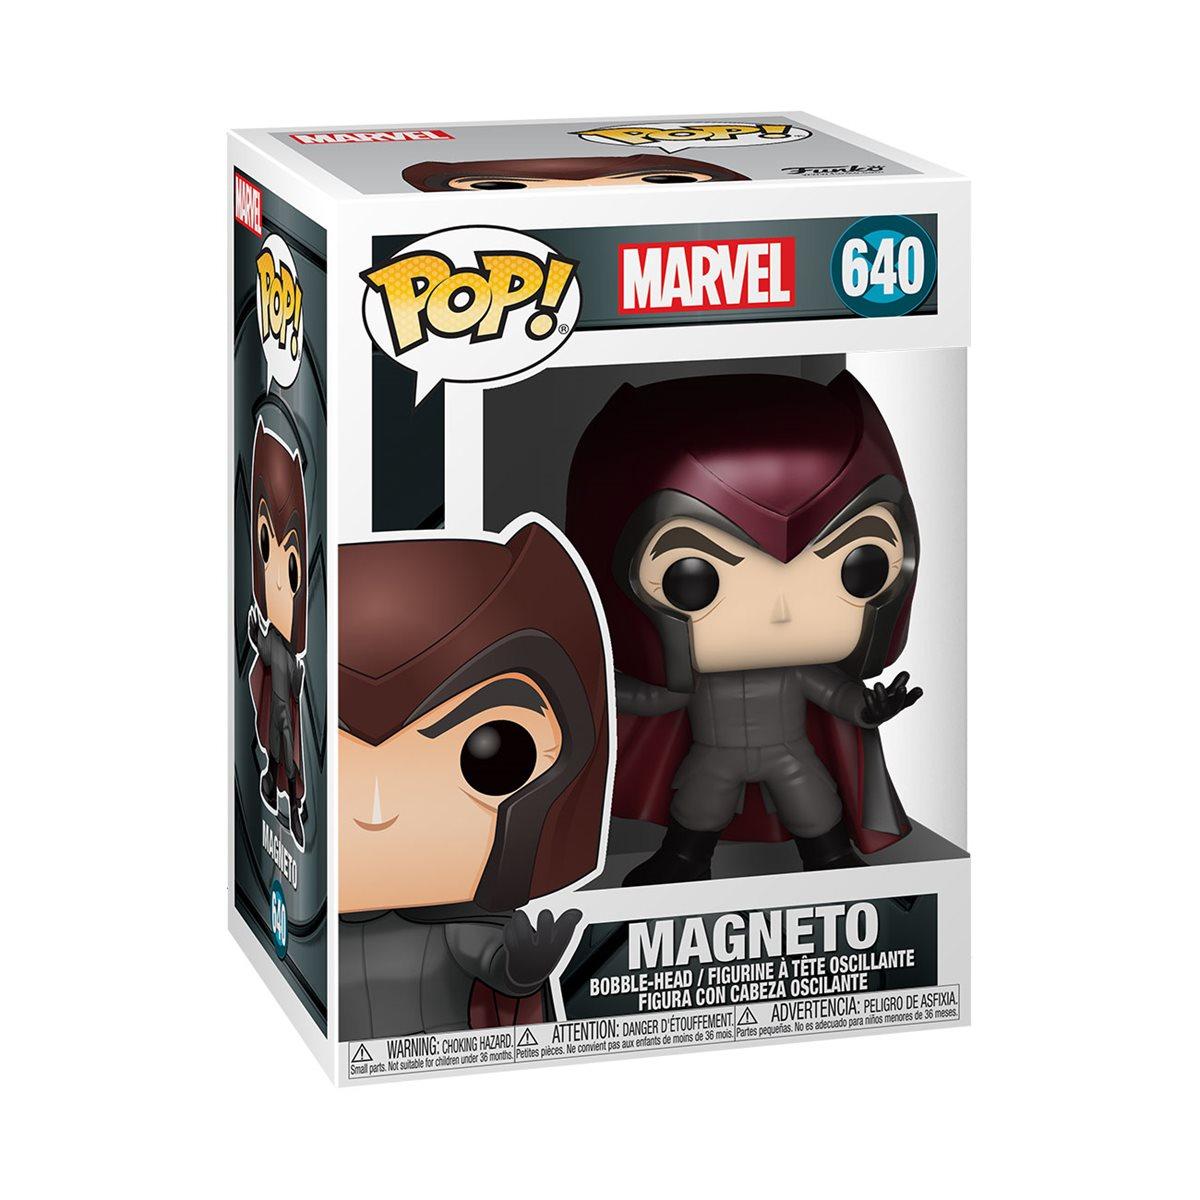 MARVEL: X-Men 20th- Magneto FUNKO POP Vinyl Figure New Toy